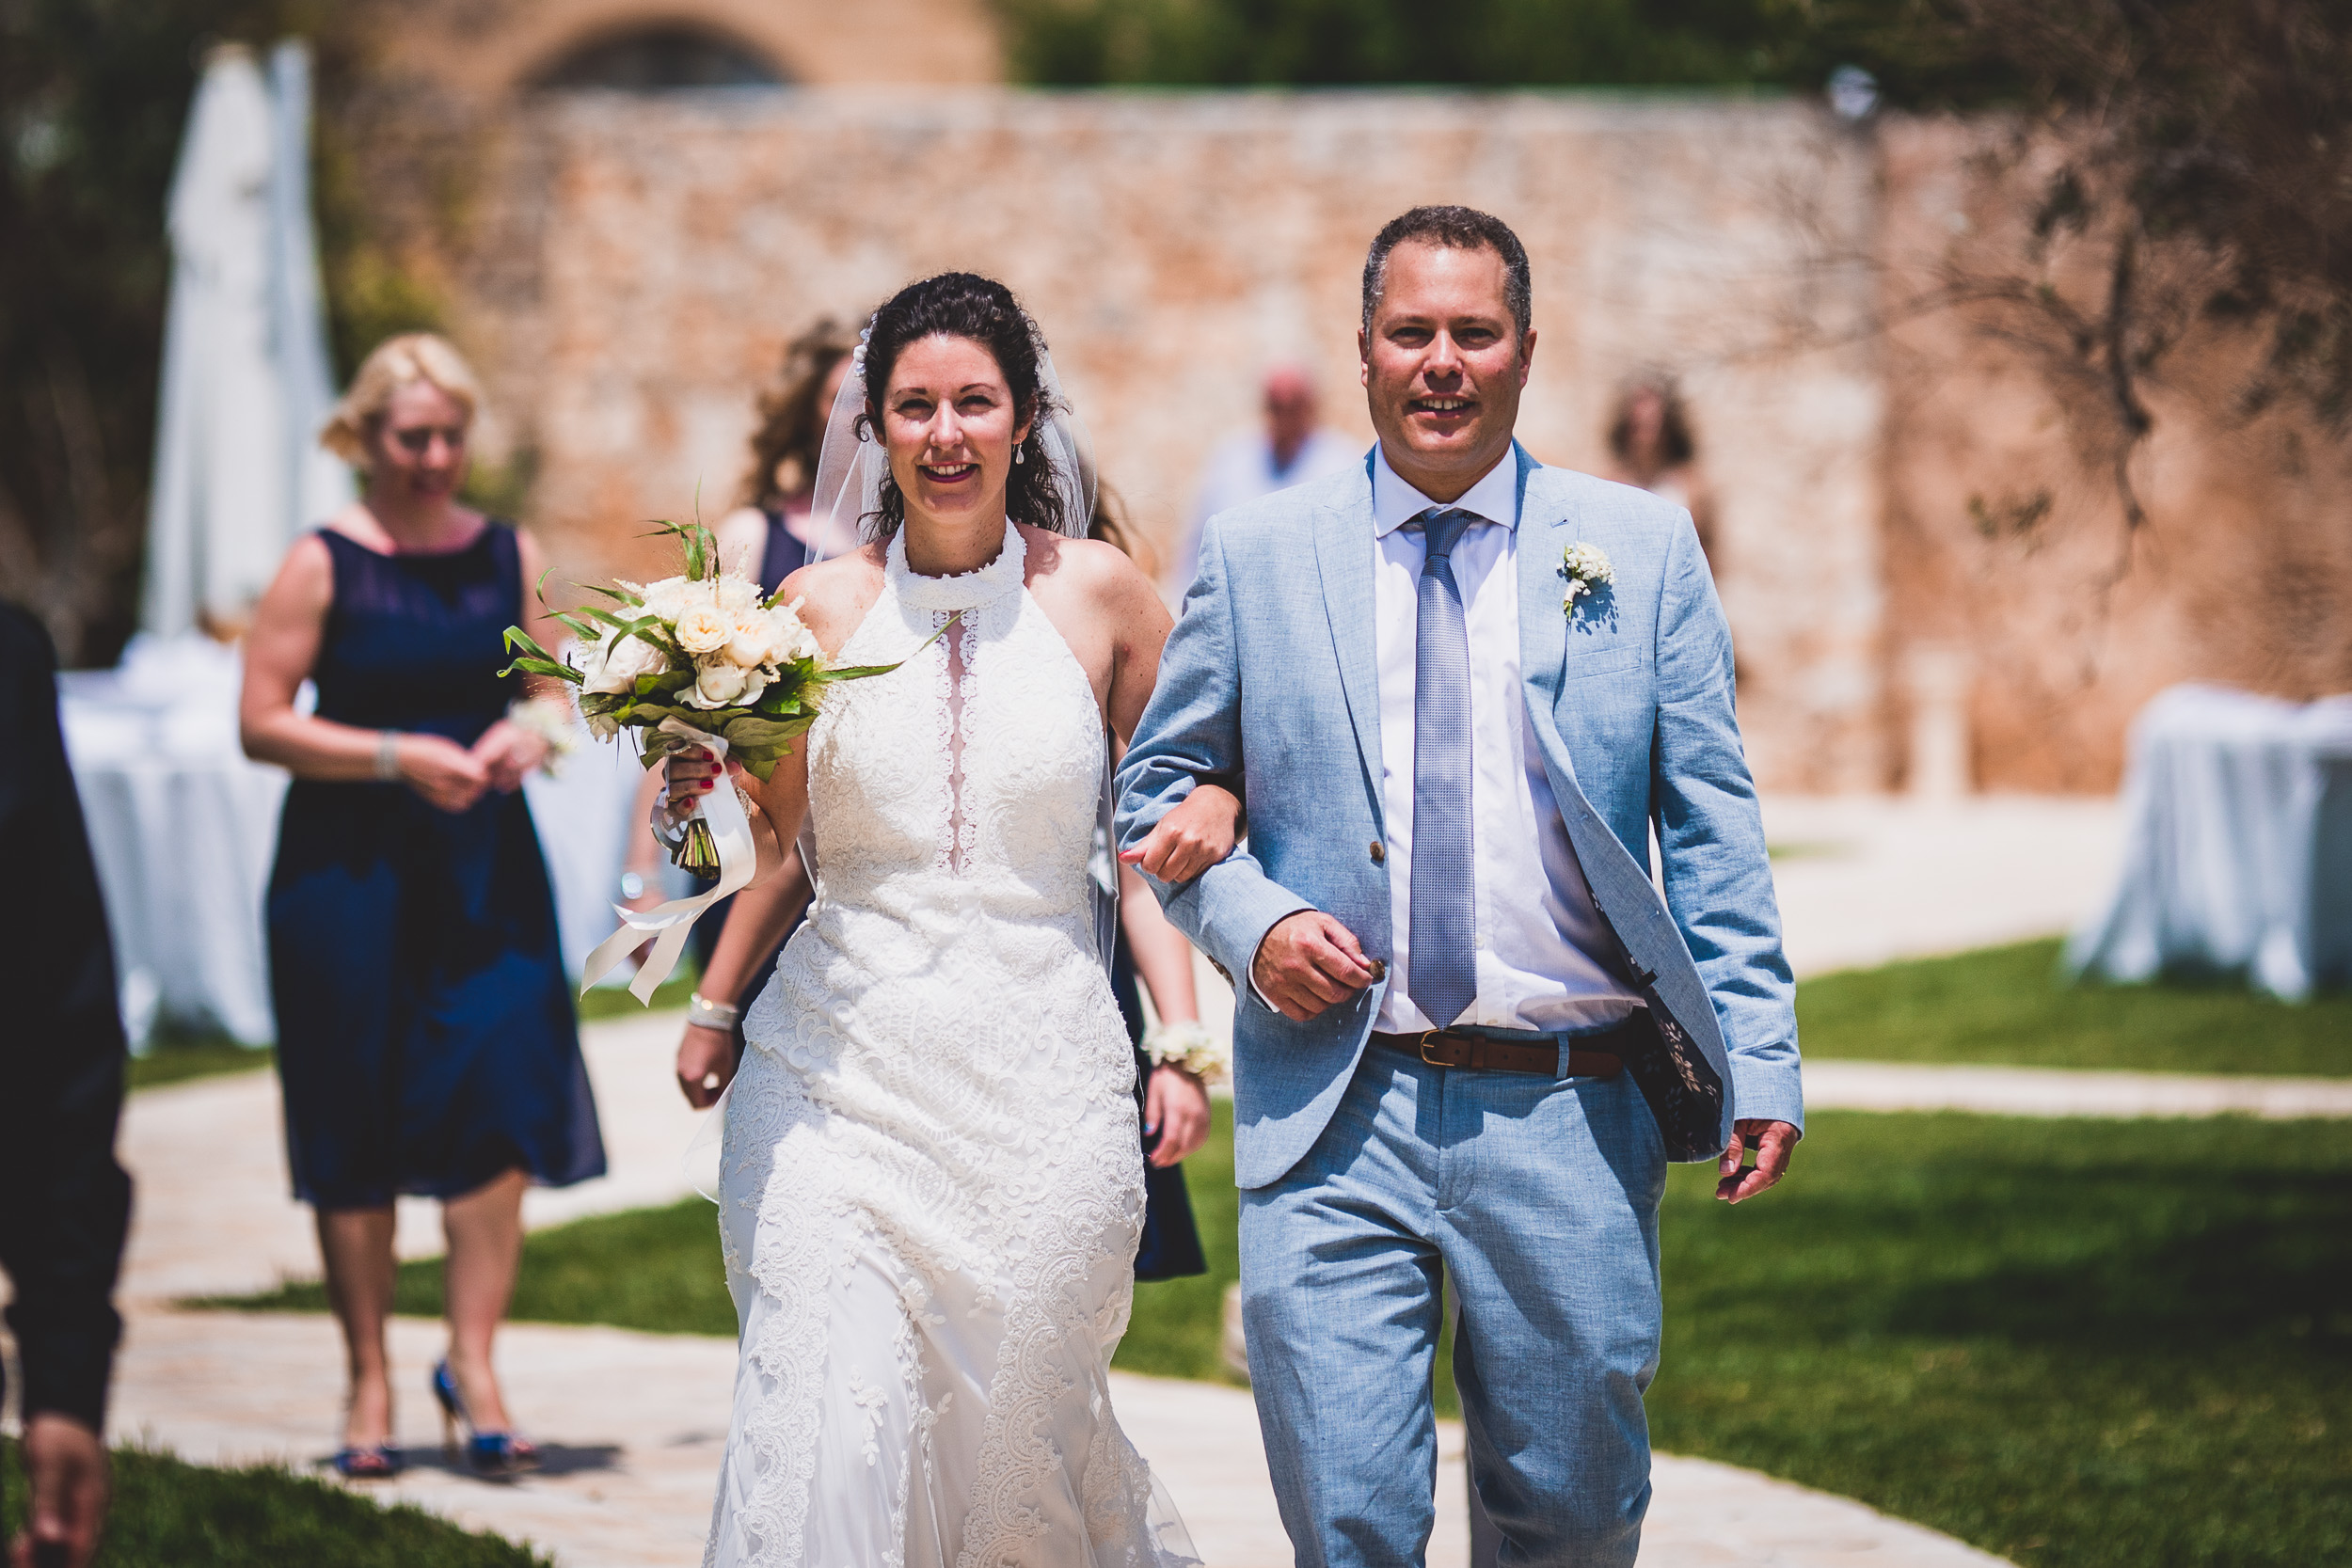 Destination wedding photography | Anna & Nigel destination wedding photography 029